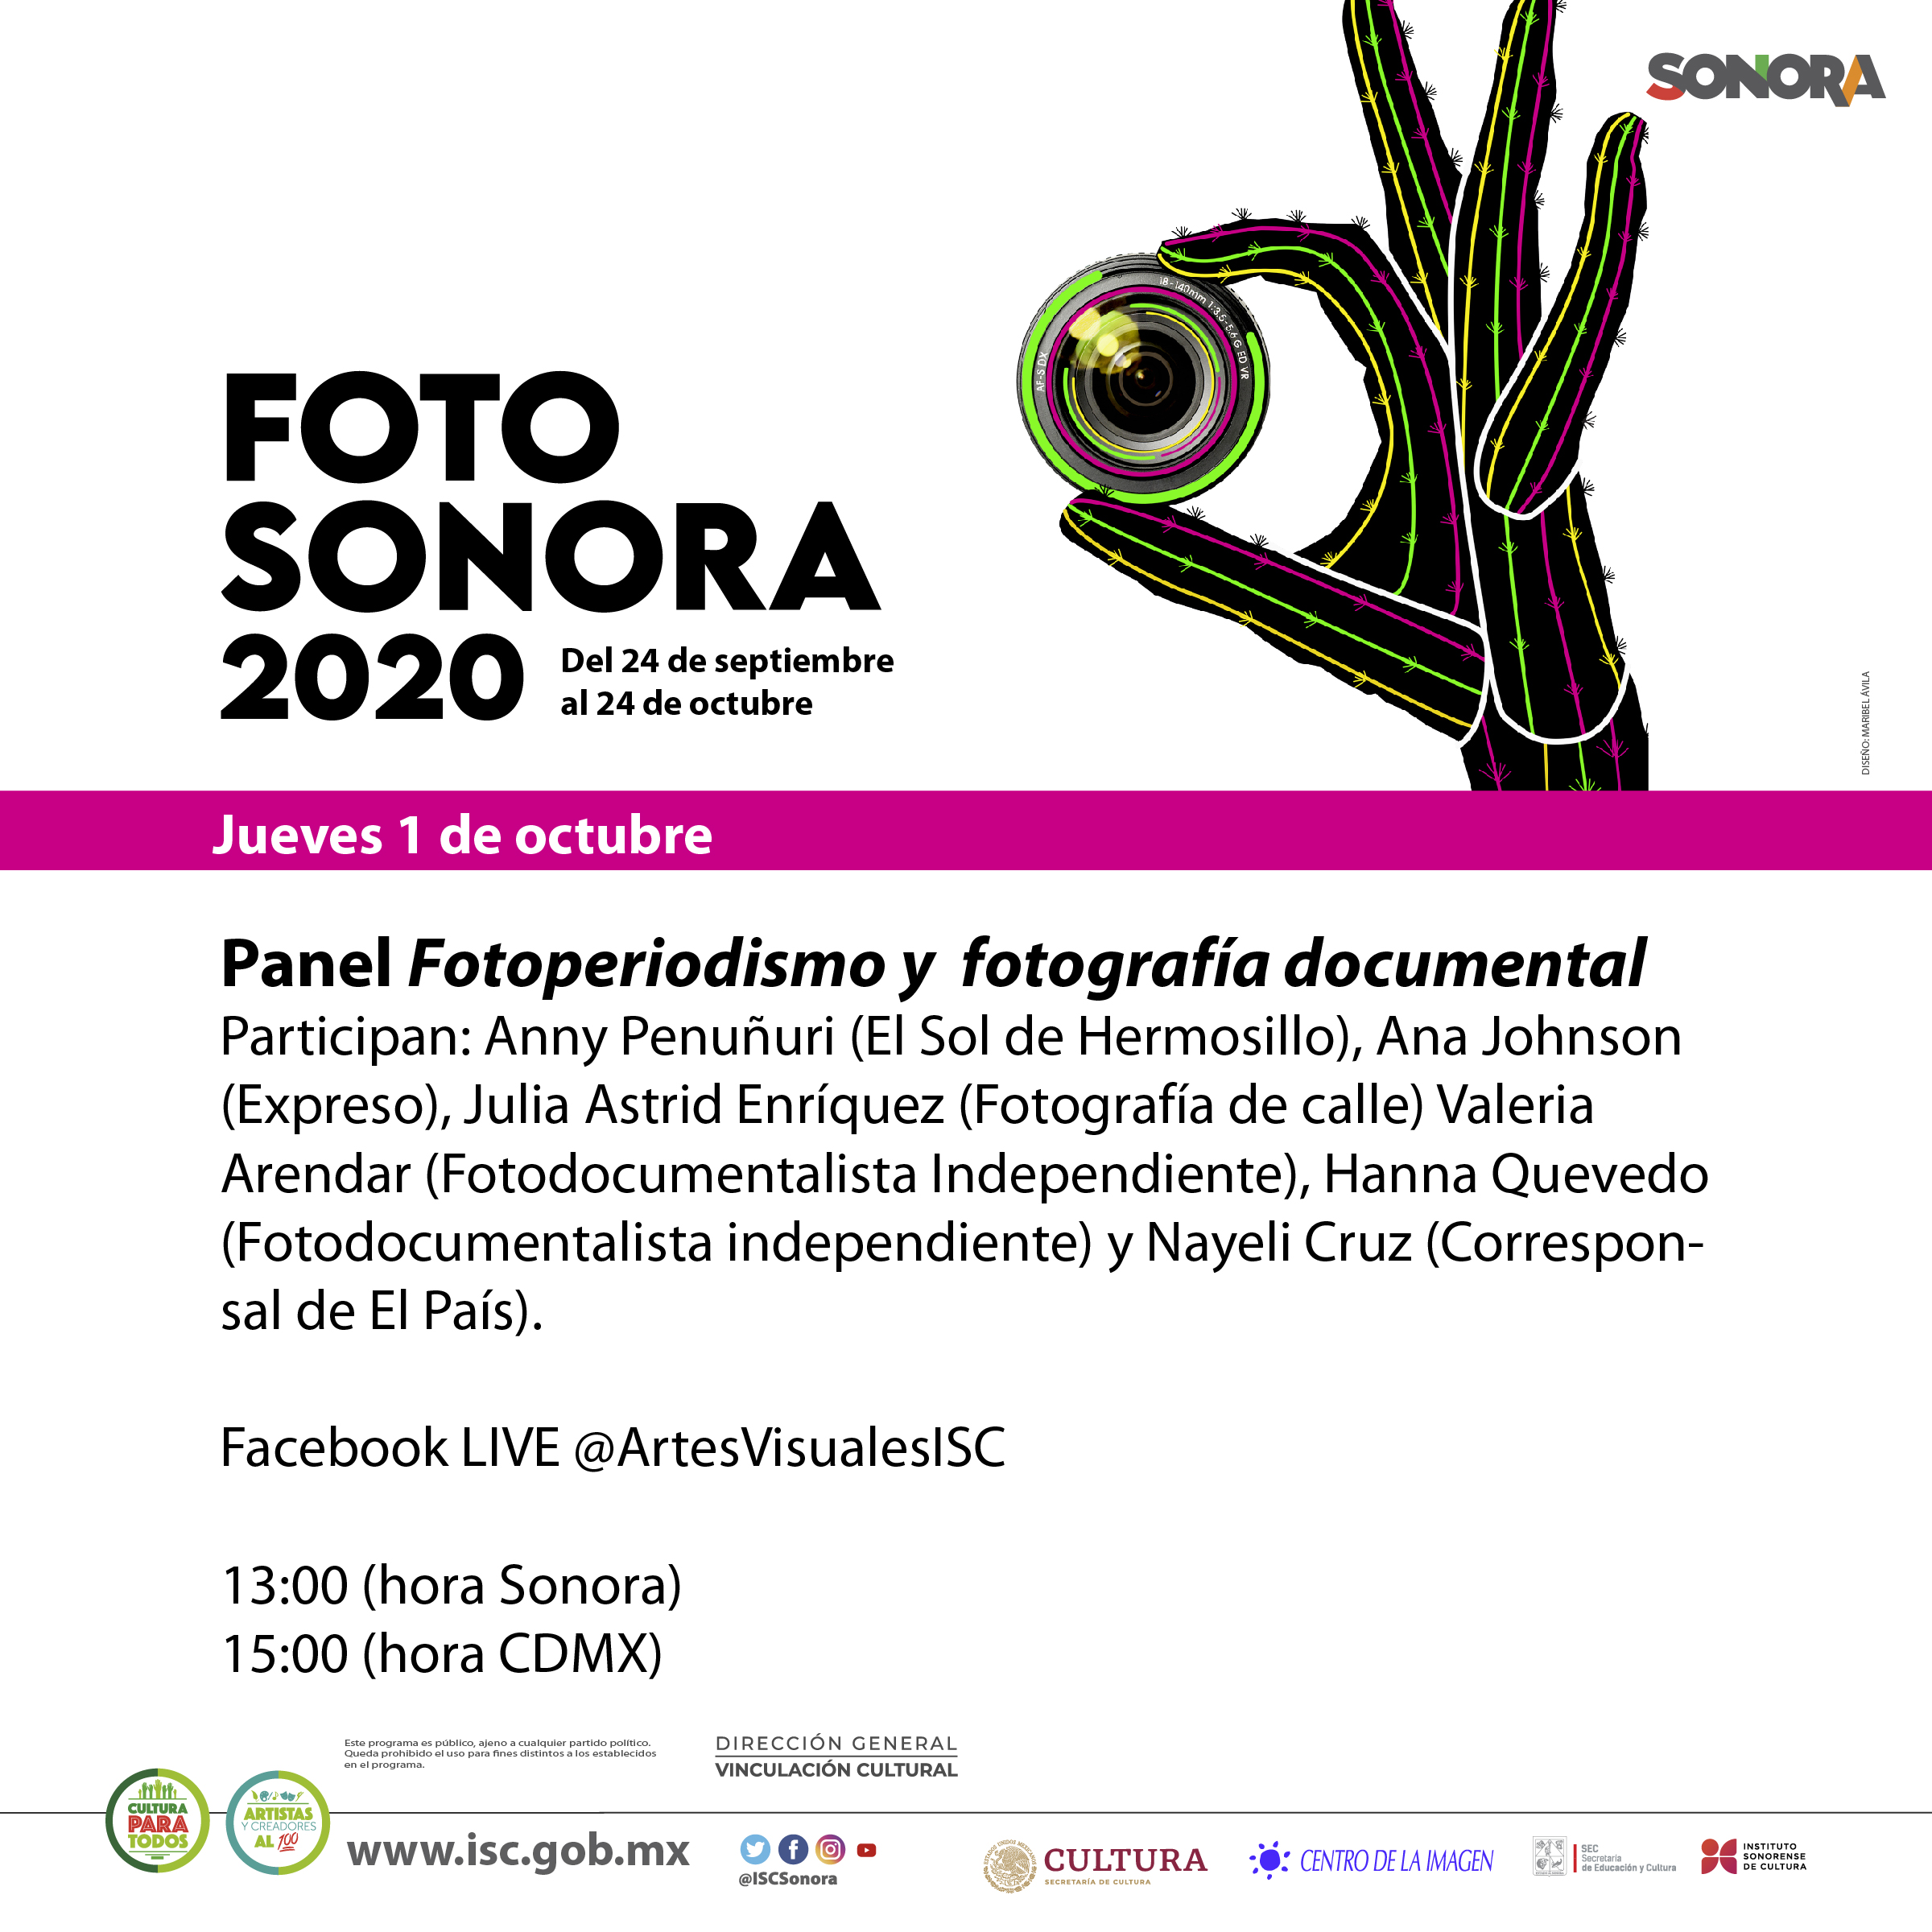 FotoSonora 2020